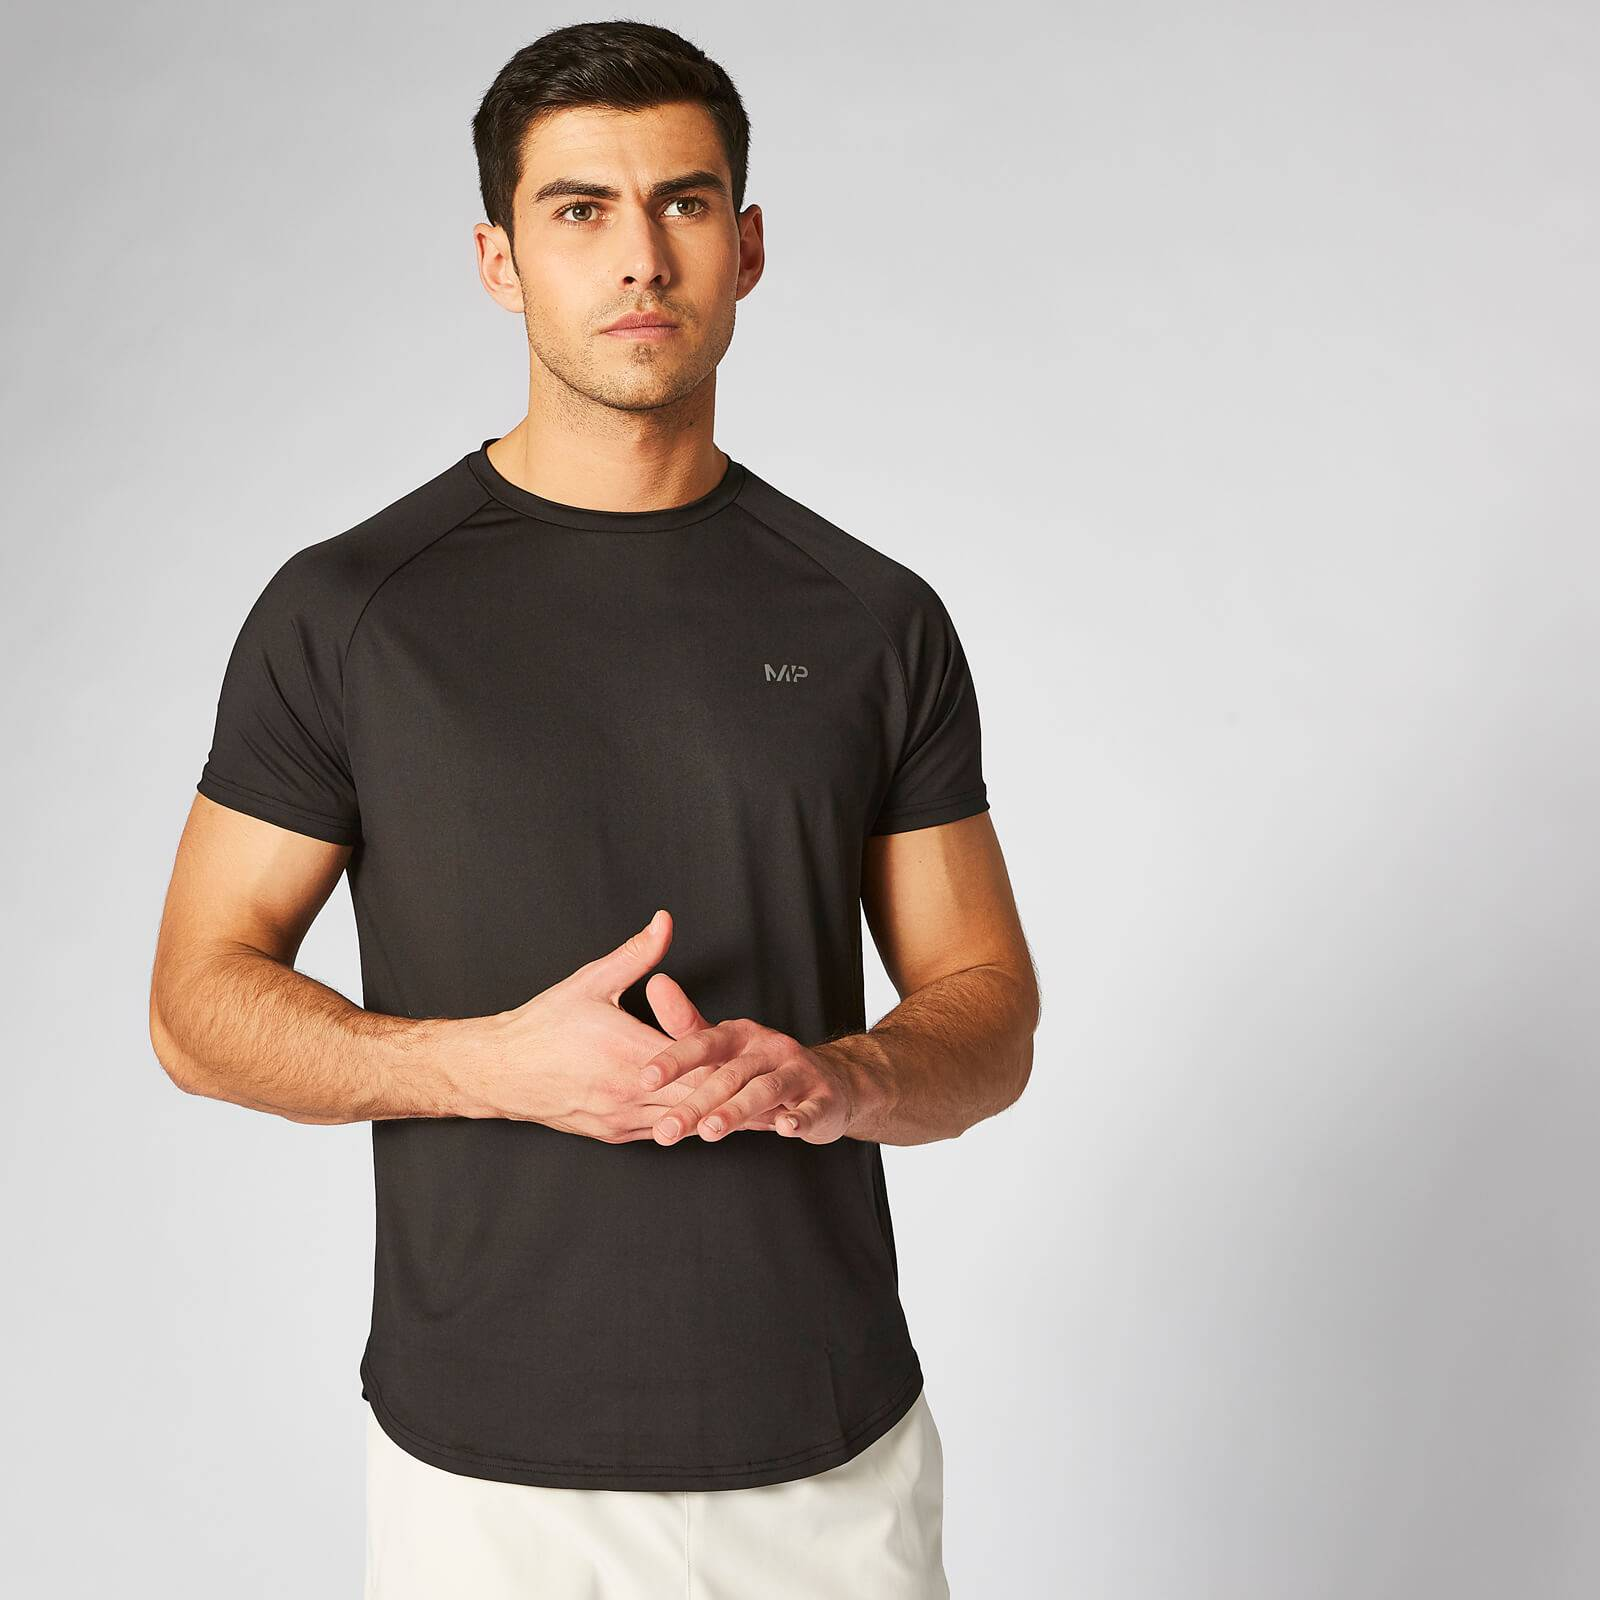 Myprotein Dry-Tech Infinity T-Shirt - Black - L